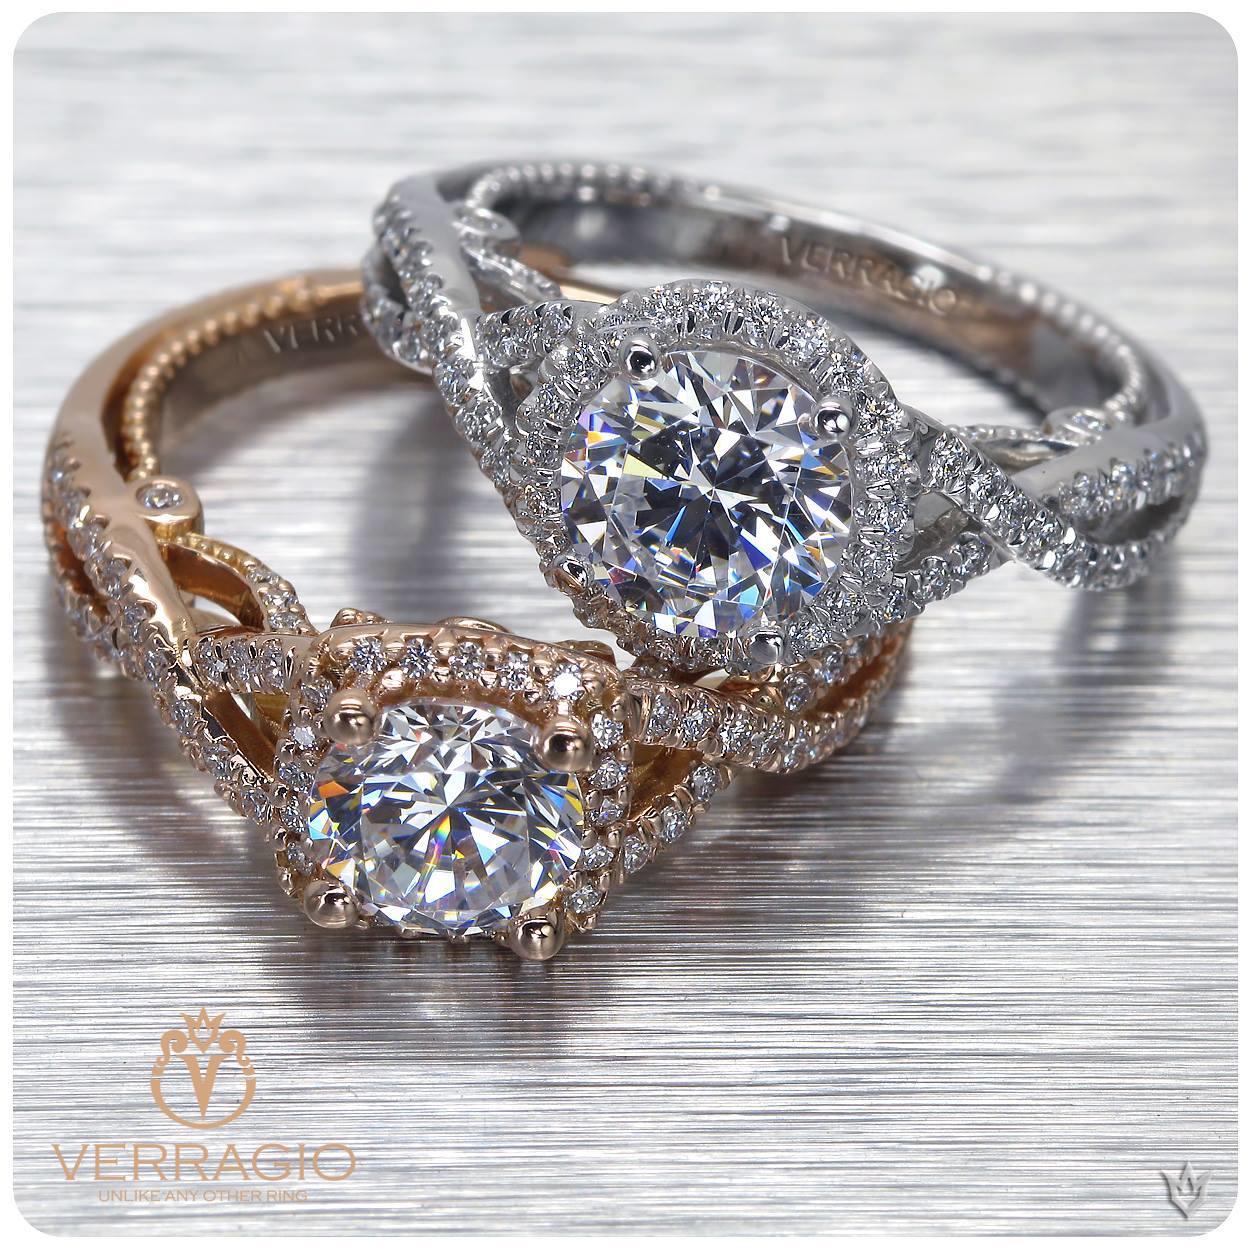 Emerald Lady Jewelry image 76